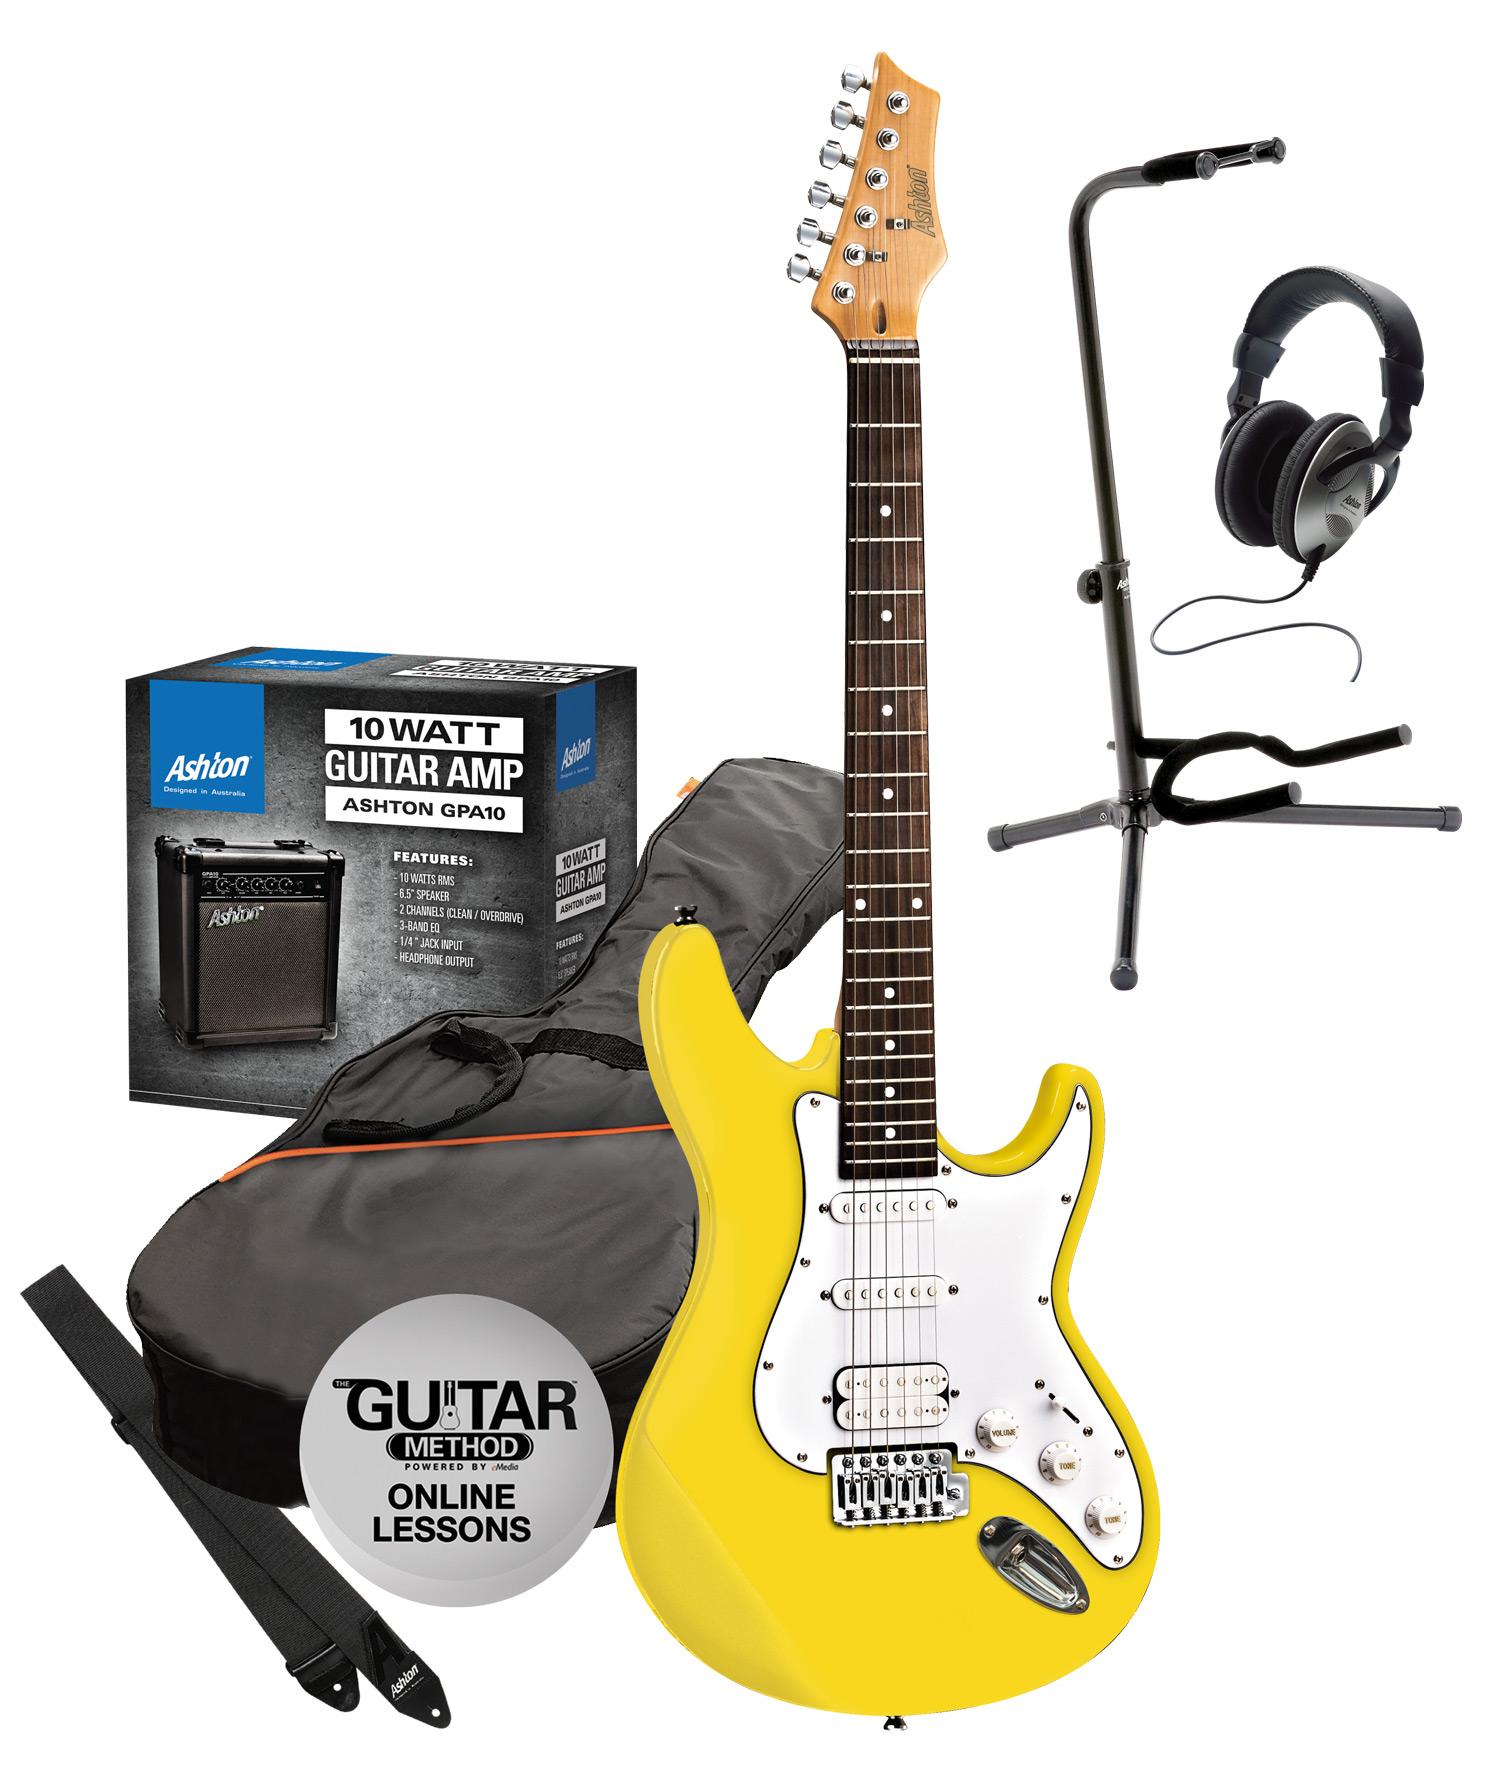 musicworks guitars electric guitar packs w amp electric guitar packs ashton electric. Black Bedroom Furniture Sets. Home Design Ideas